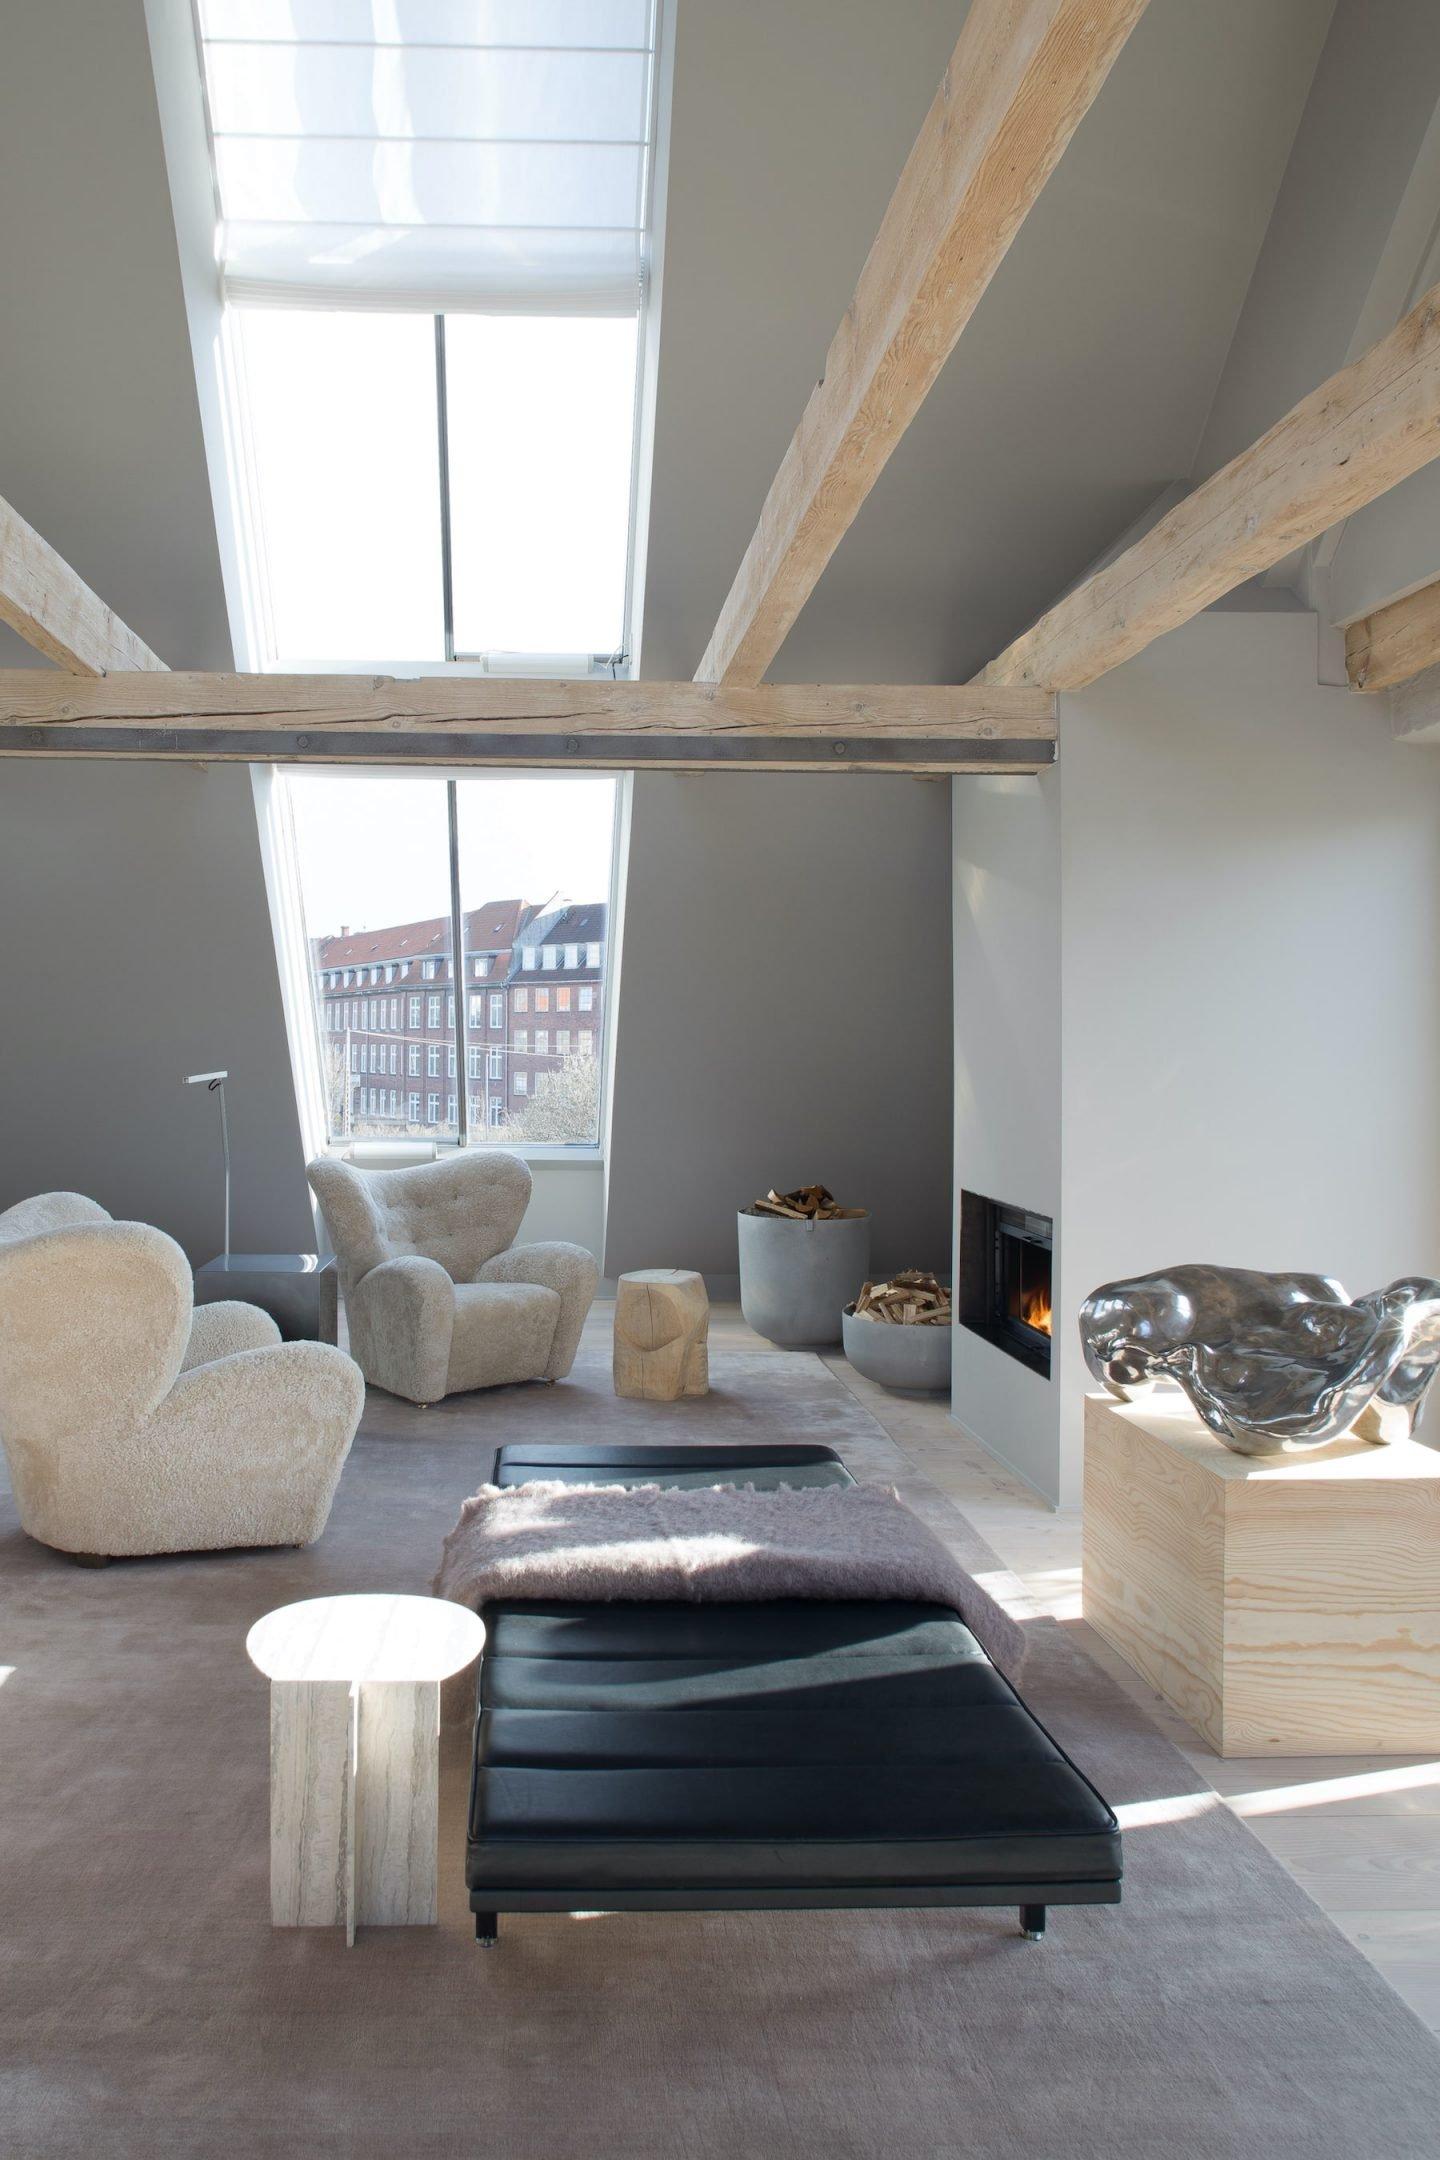 IGNANT-Design-David-Thulstrup-Studio-Visit-004